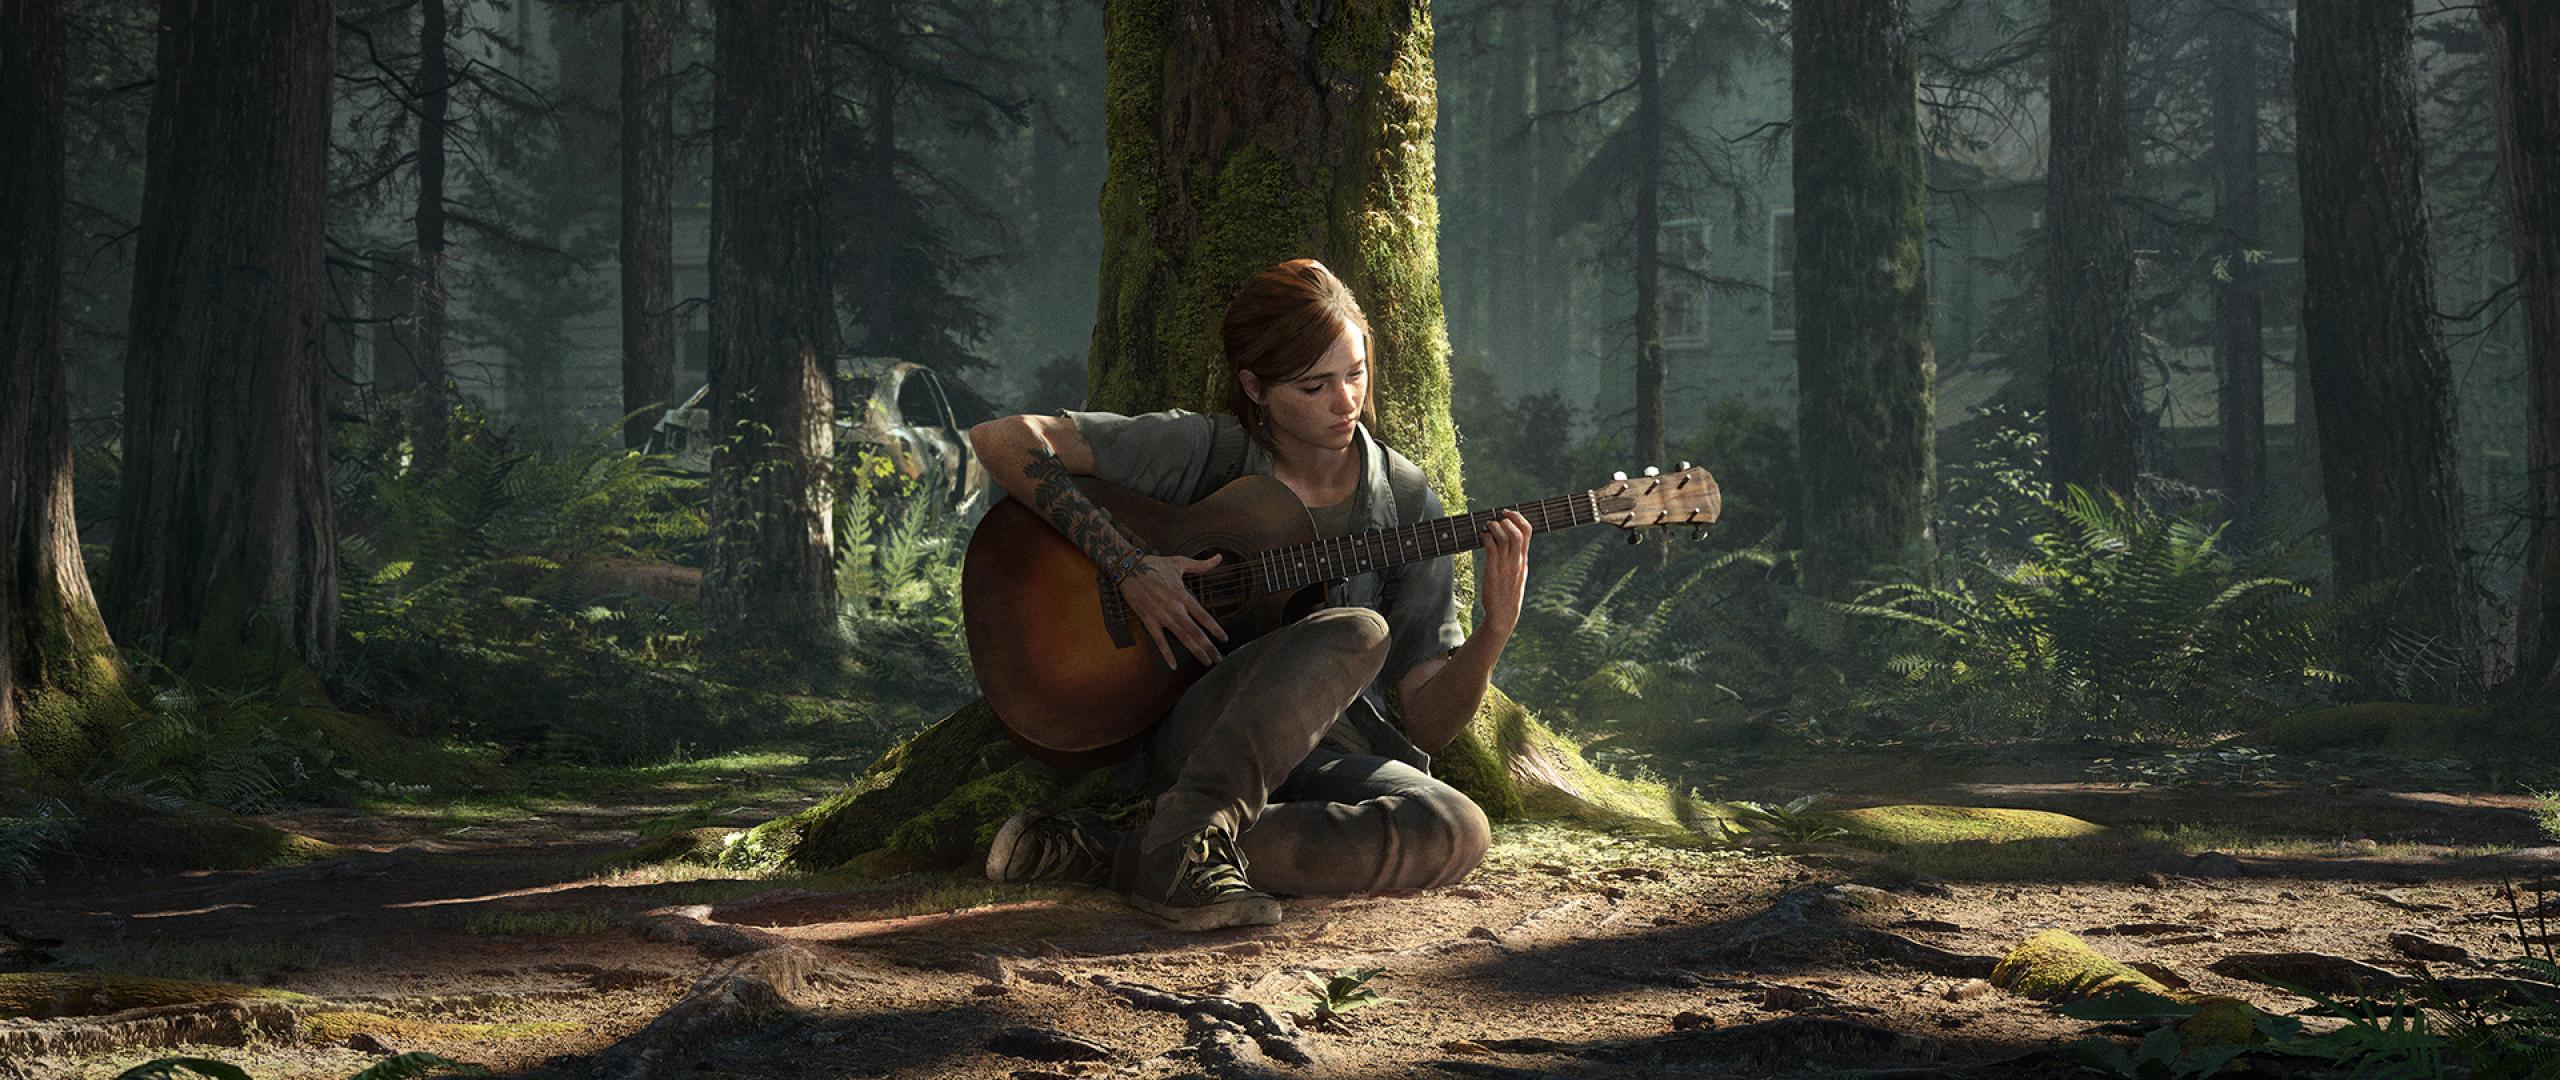 2560x1080 Ellie The Last of Us 2 2560x1080 Resolution Wallpaper 2560x1080